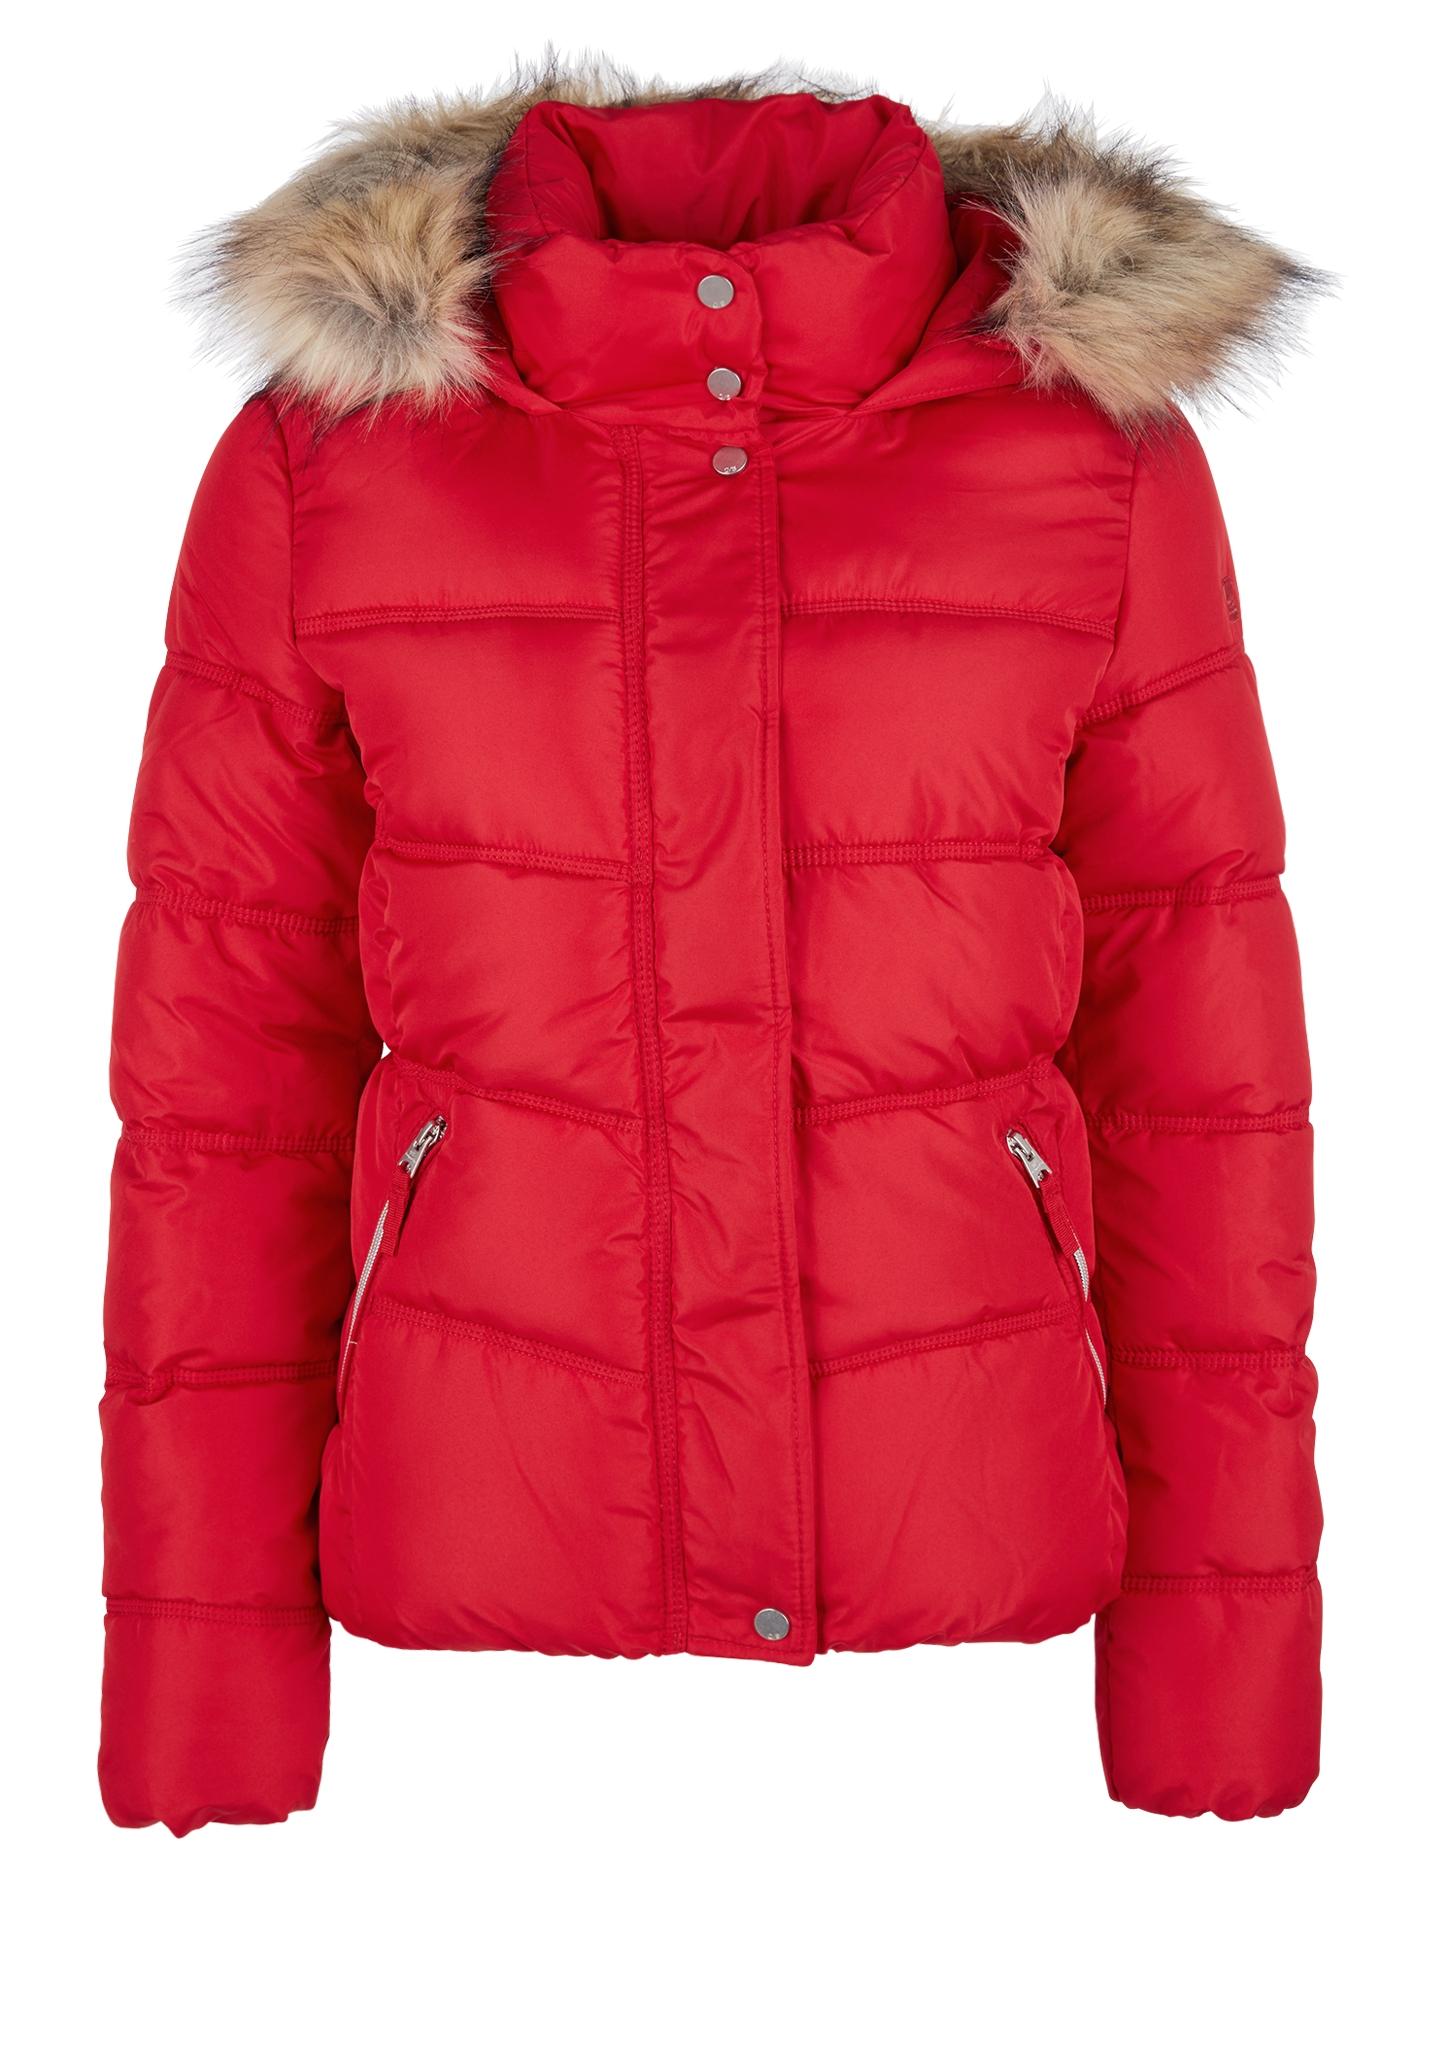 Outdoor-Jacke | Sportbekleidung > Sportjacken > Outdoorjacken | Rot | Obermaterial 100% polyester| kunstpelz 80% polyacryl -  20% modacryl| futter 100% polyester| füllmaterial 100% polyester | Q/S designed by